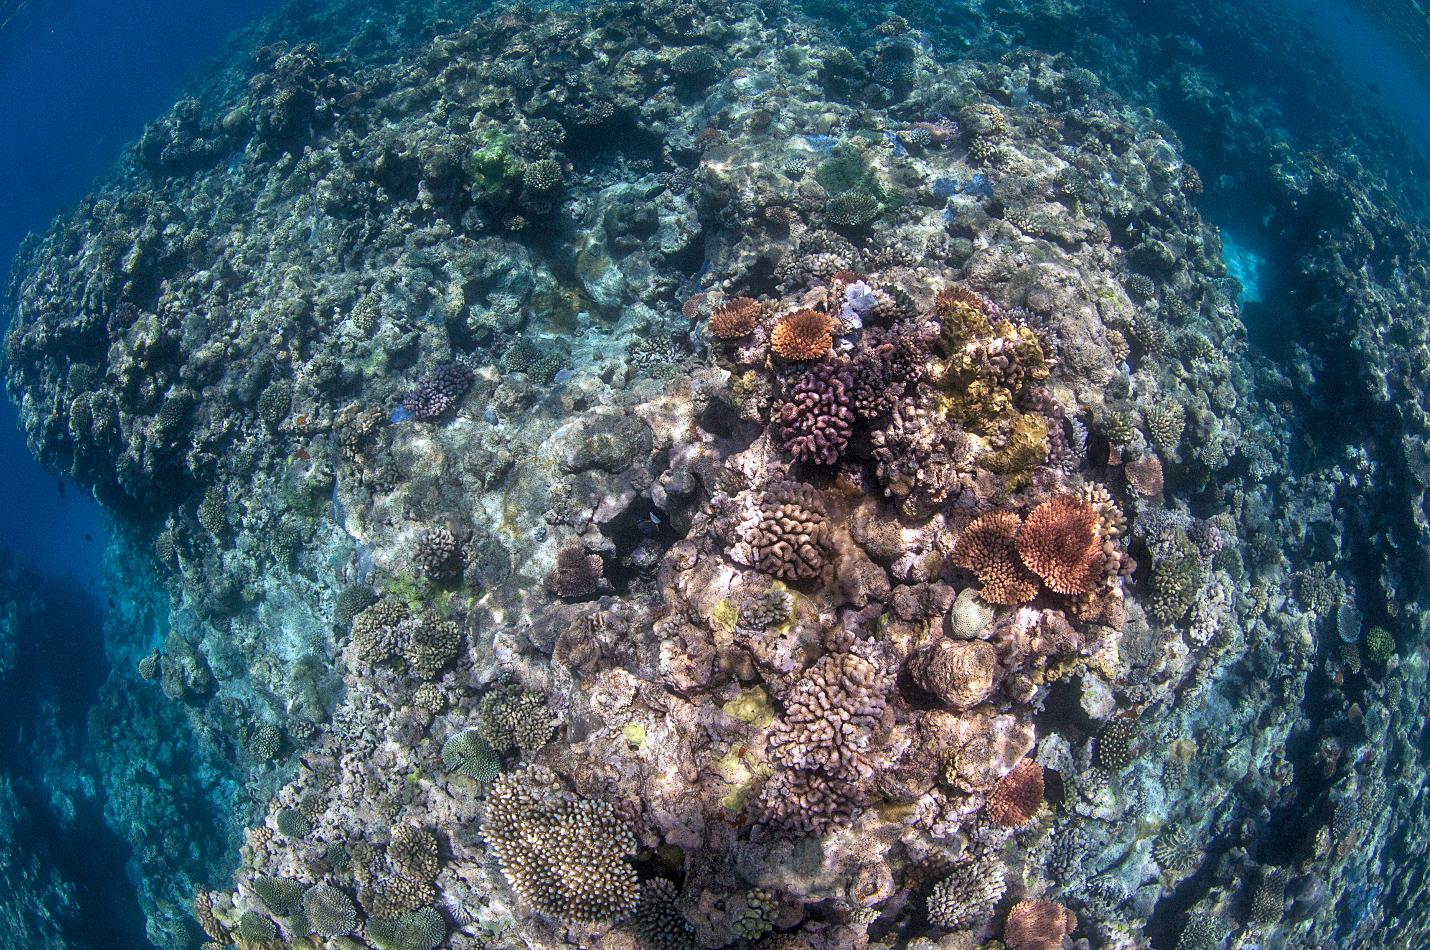 birdseye of coral in the Great barrier reef credit: jayne jenkins / coral reef image bank